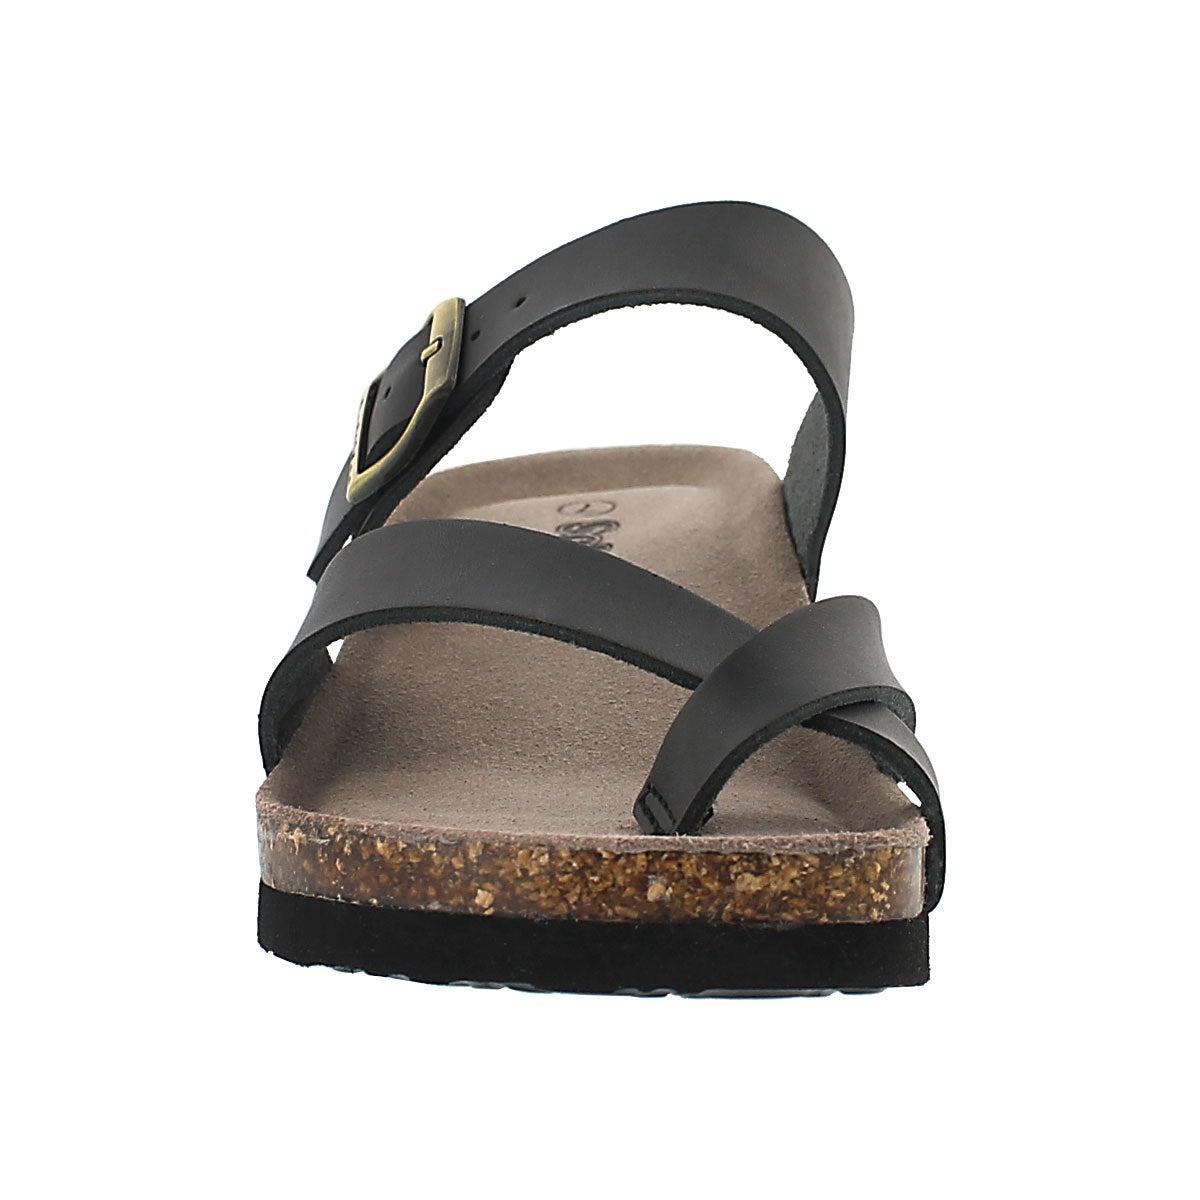 Lds Gemma black mem. foam wdge sandal